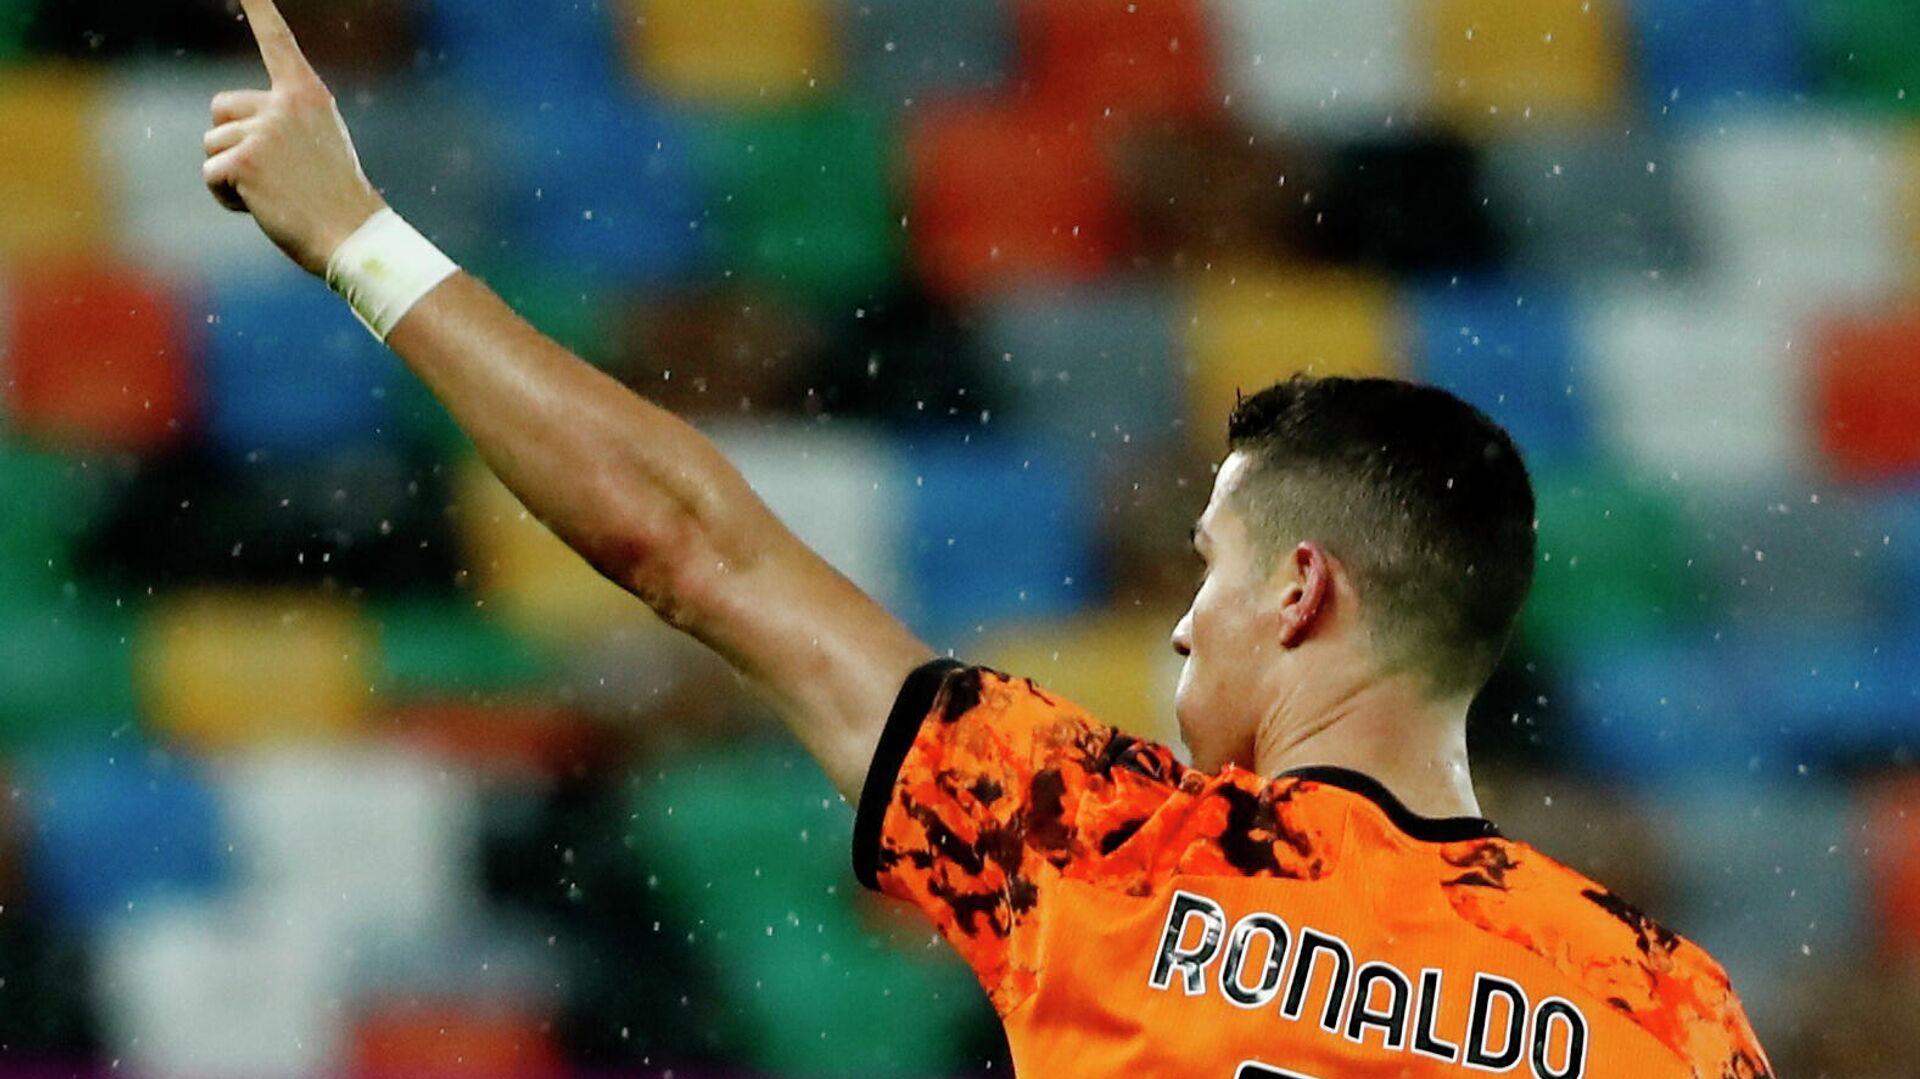 Cristiano Ronaldo, el futbolista portugués - Sputnik Mundo, 1920, 24.05.2021